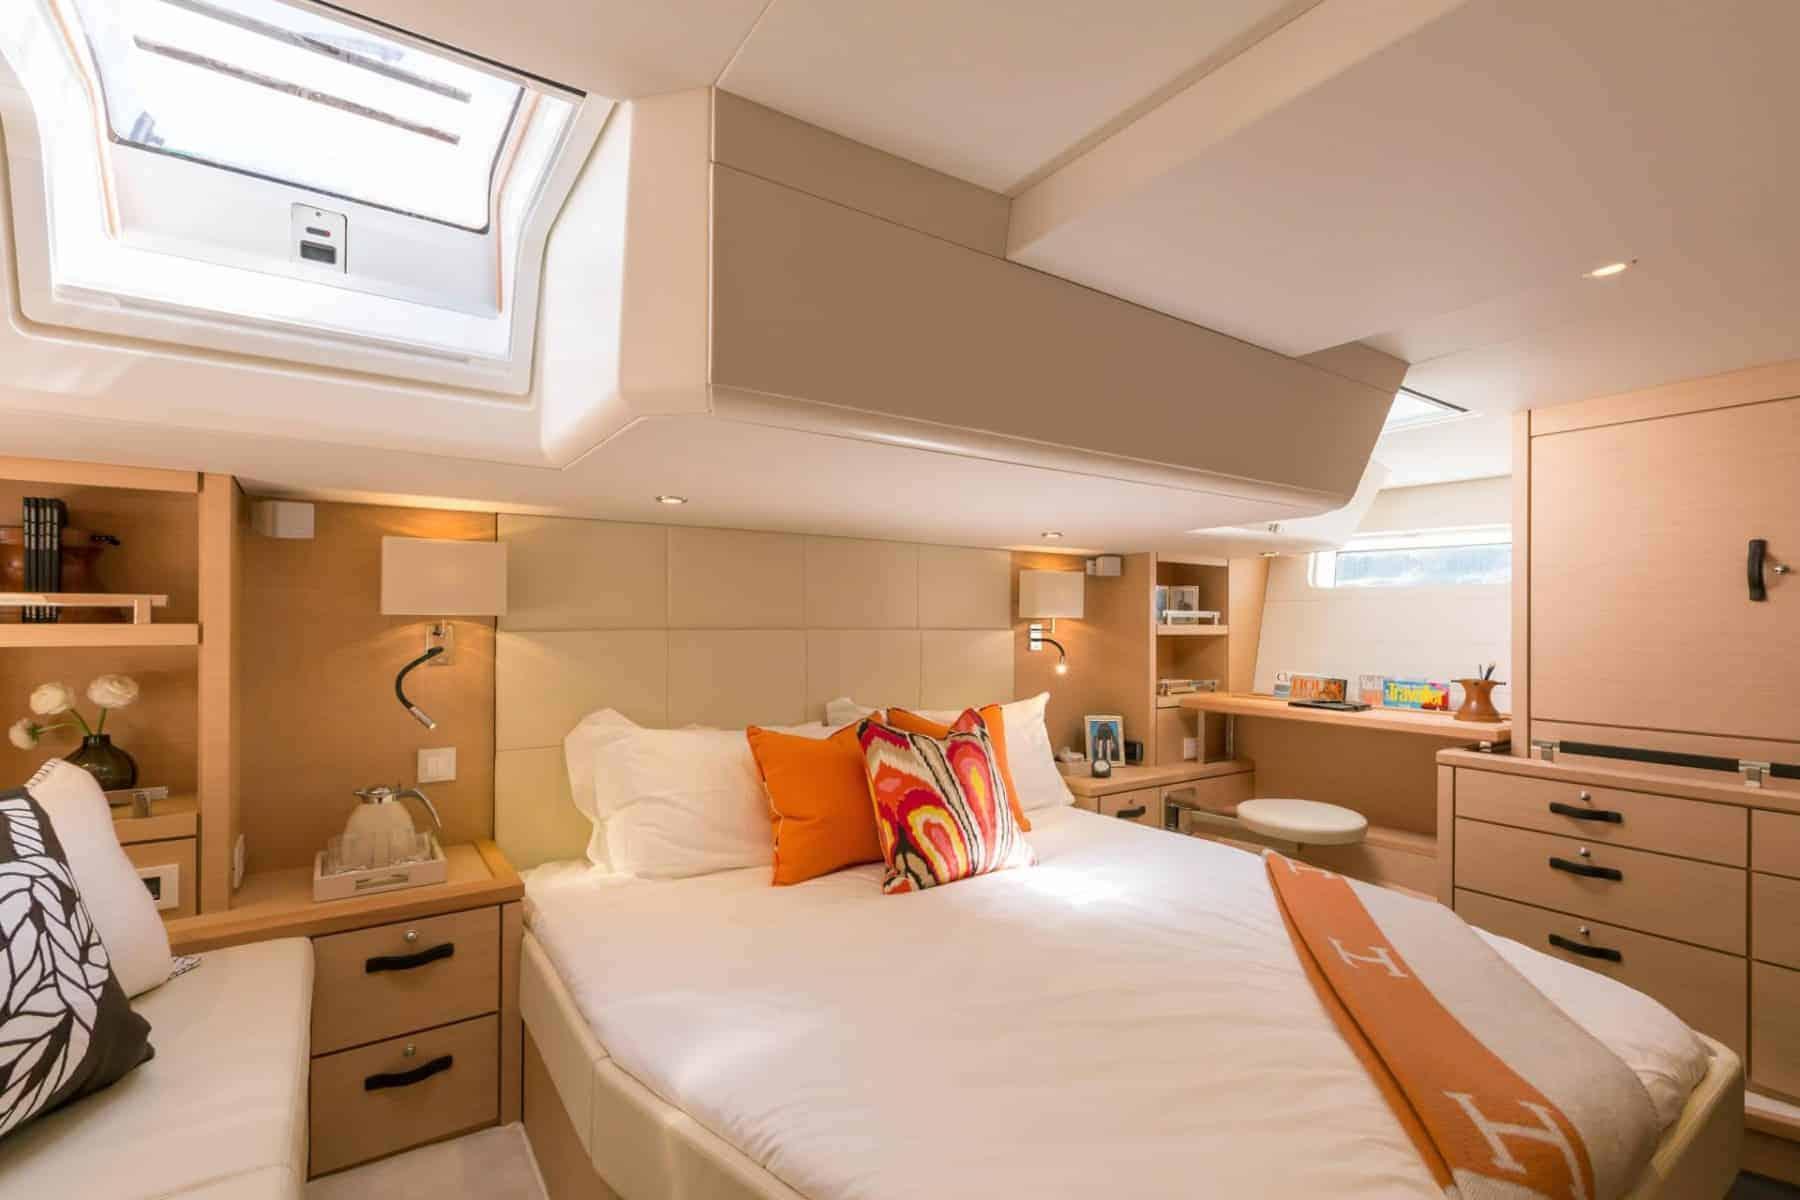 Jeanneau-64-interior-cabin-5-charter-ownership-yacht